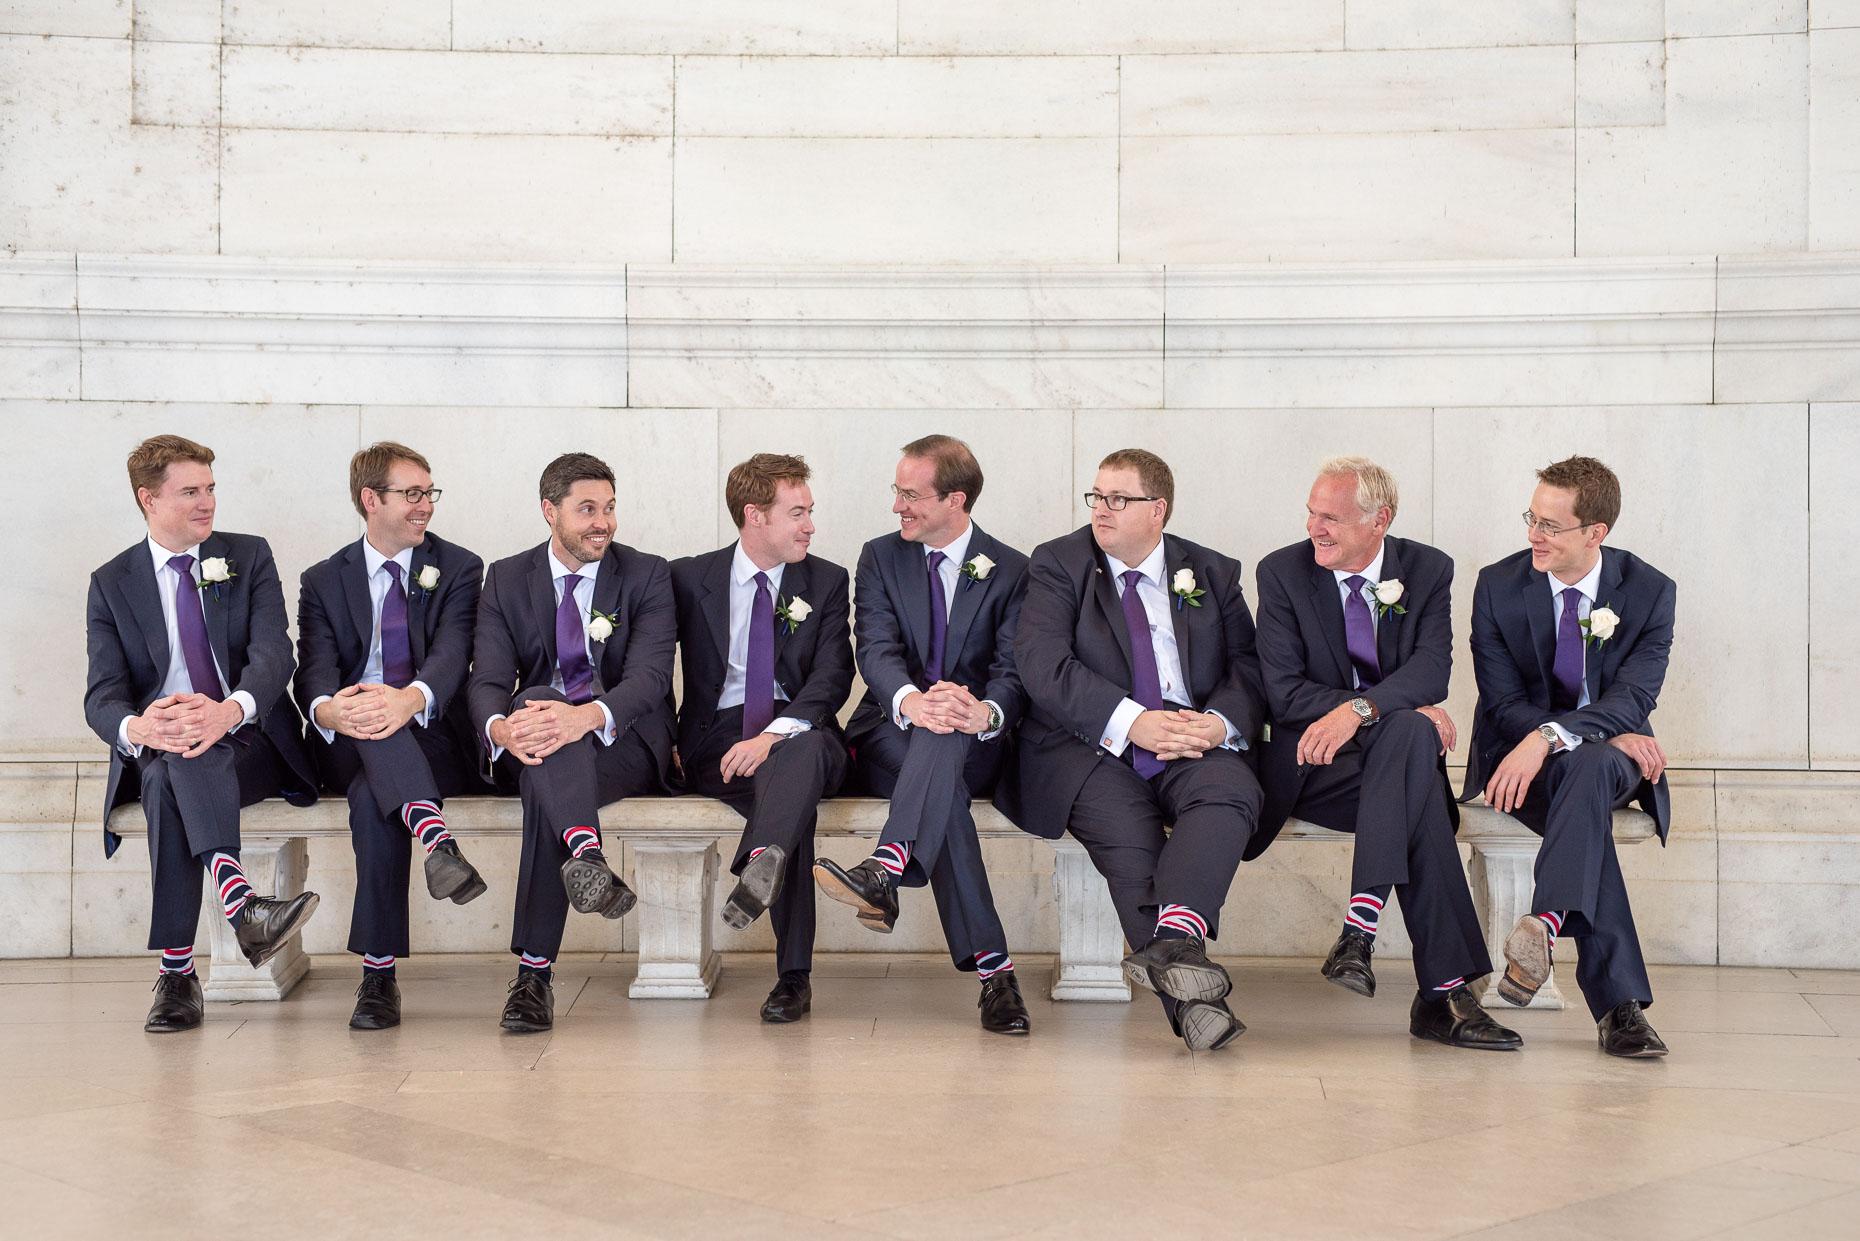 Weddings by Elliott O'Donovan - Washington DC_-35.jpg